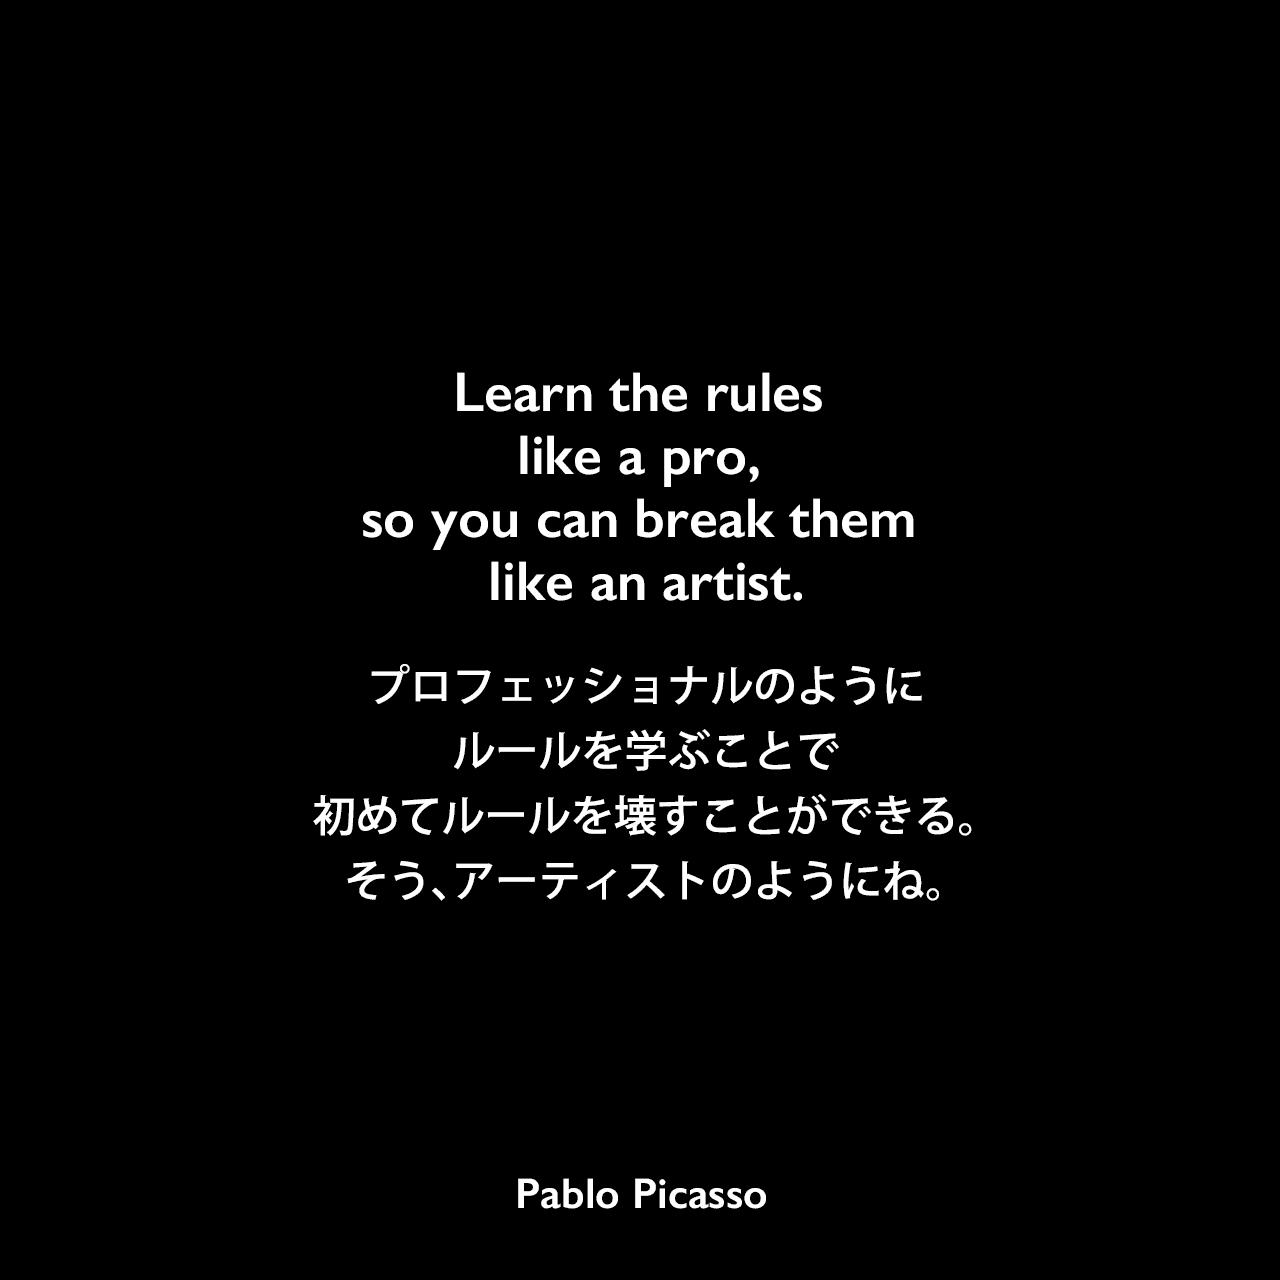 Learn the rules like a pro, so you can break them like an artist.プロフェッショナルのようにルールを学ぶことで初めてルールを壊すことができる。そう、アーティストのようにね。Pablo Picasso